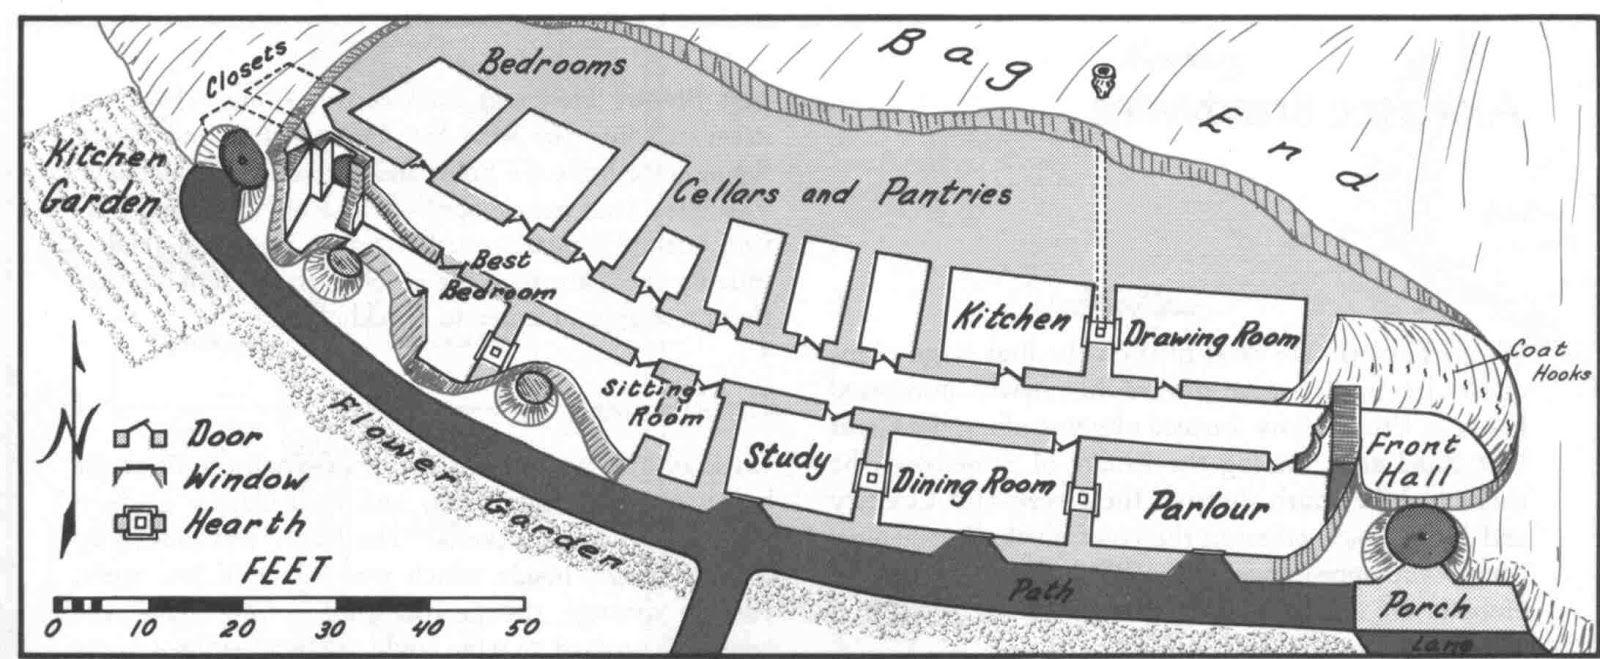 the hobbit movie blog: Bilbo Baggins\' House Plan Linear   Hobbit ...